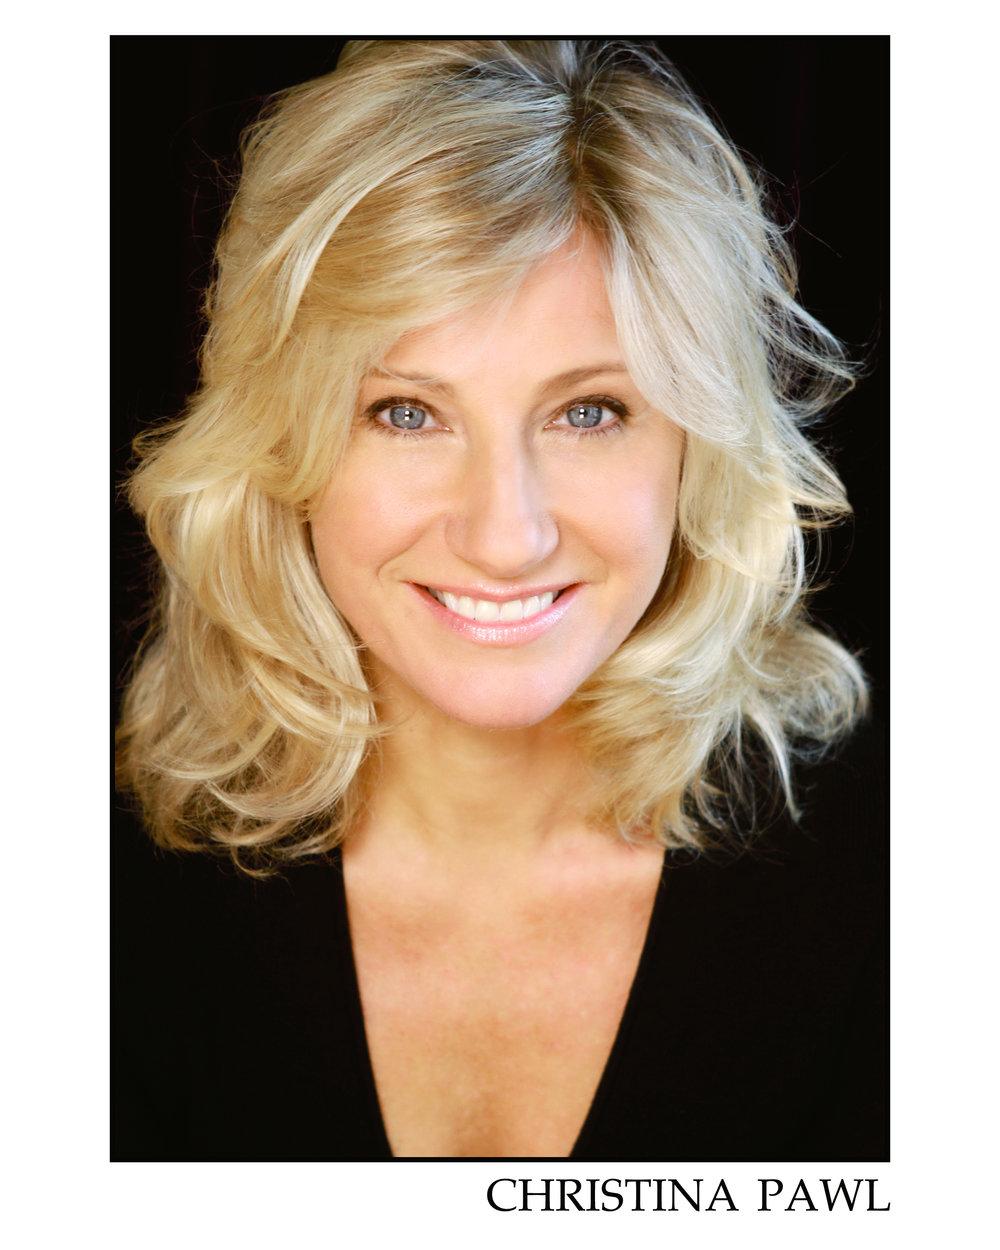 Christina Pawl